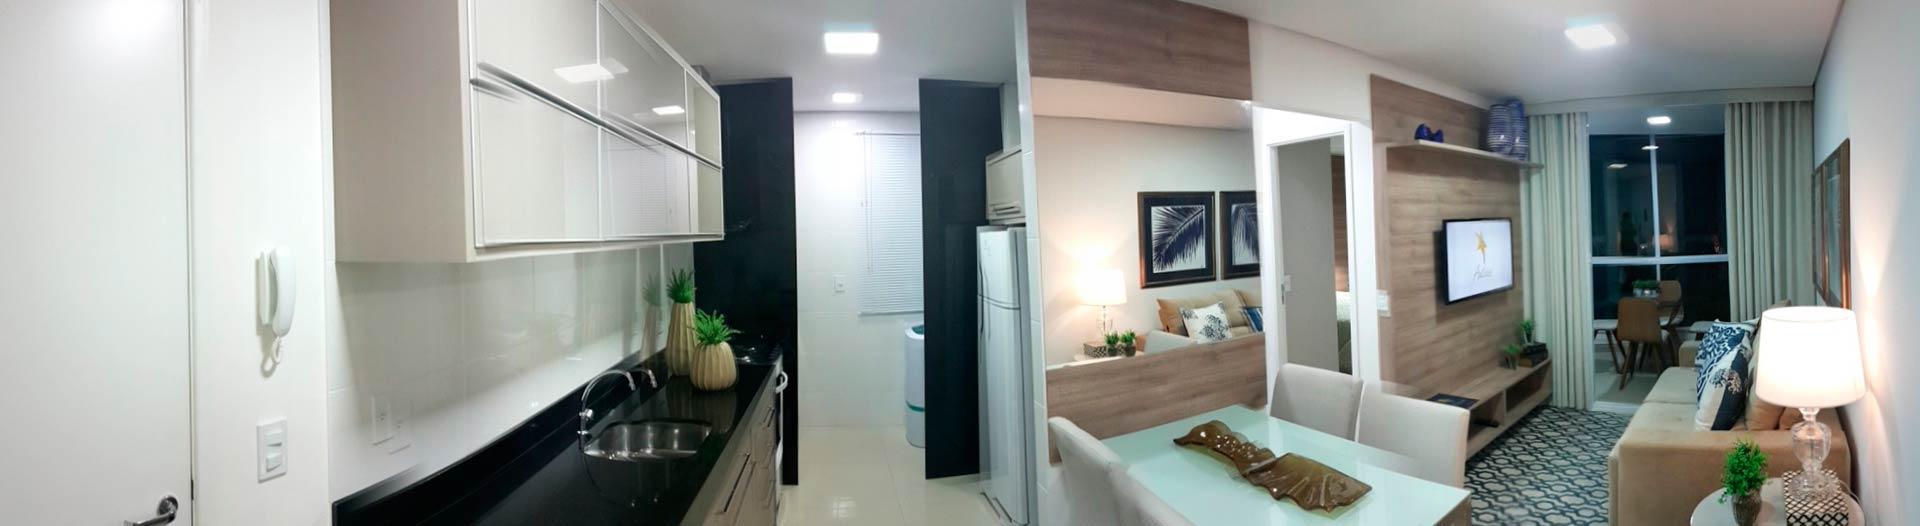 Group-Creta-Imóveis-Apartamento-decorado-Residencial-Antares-Exclusive